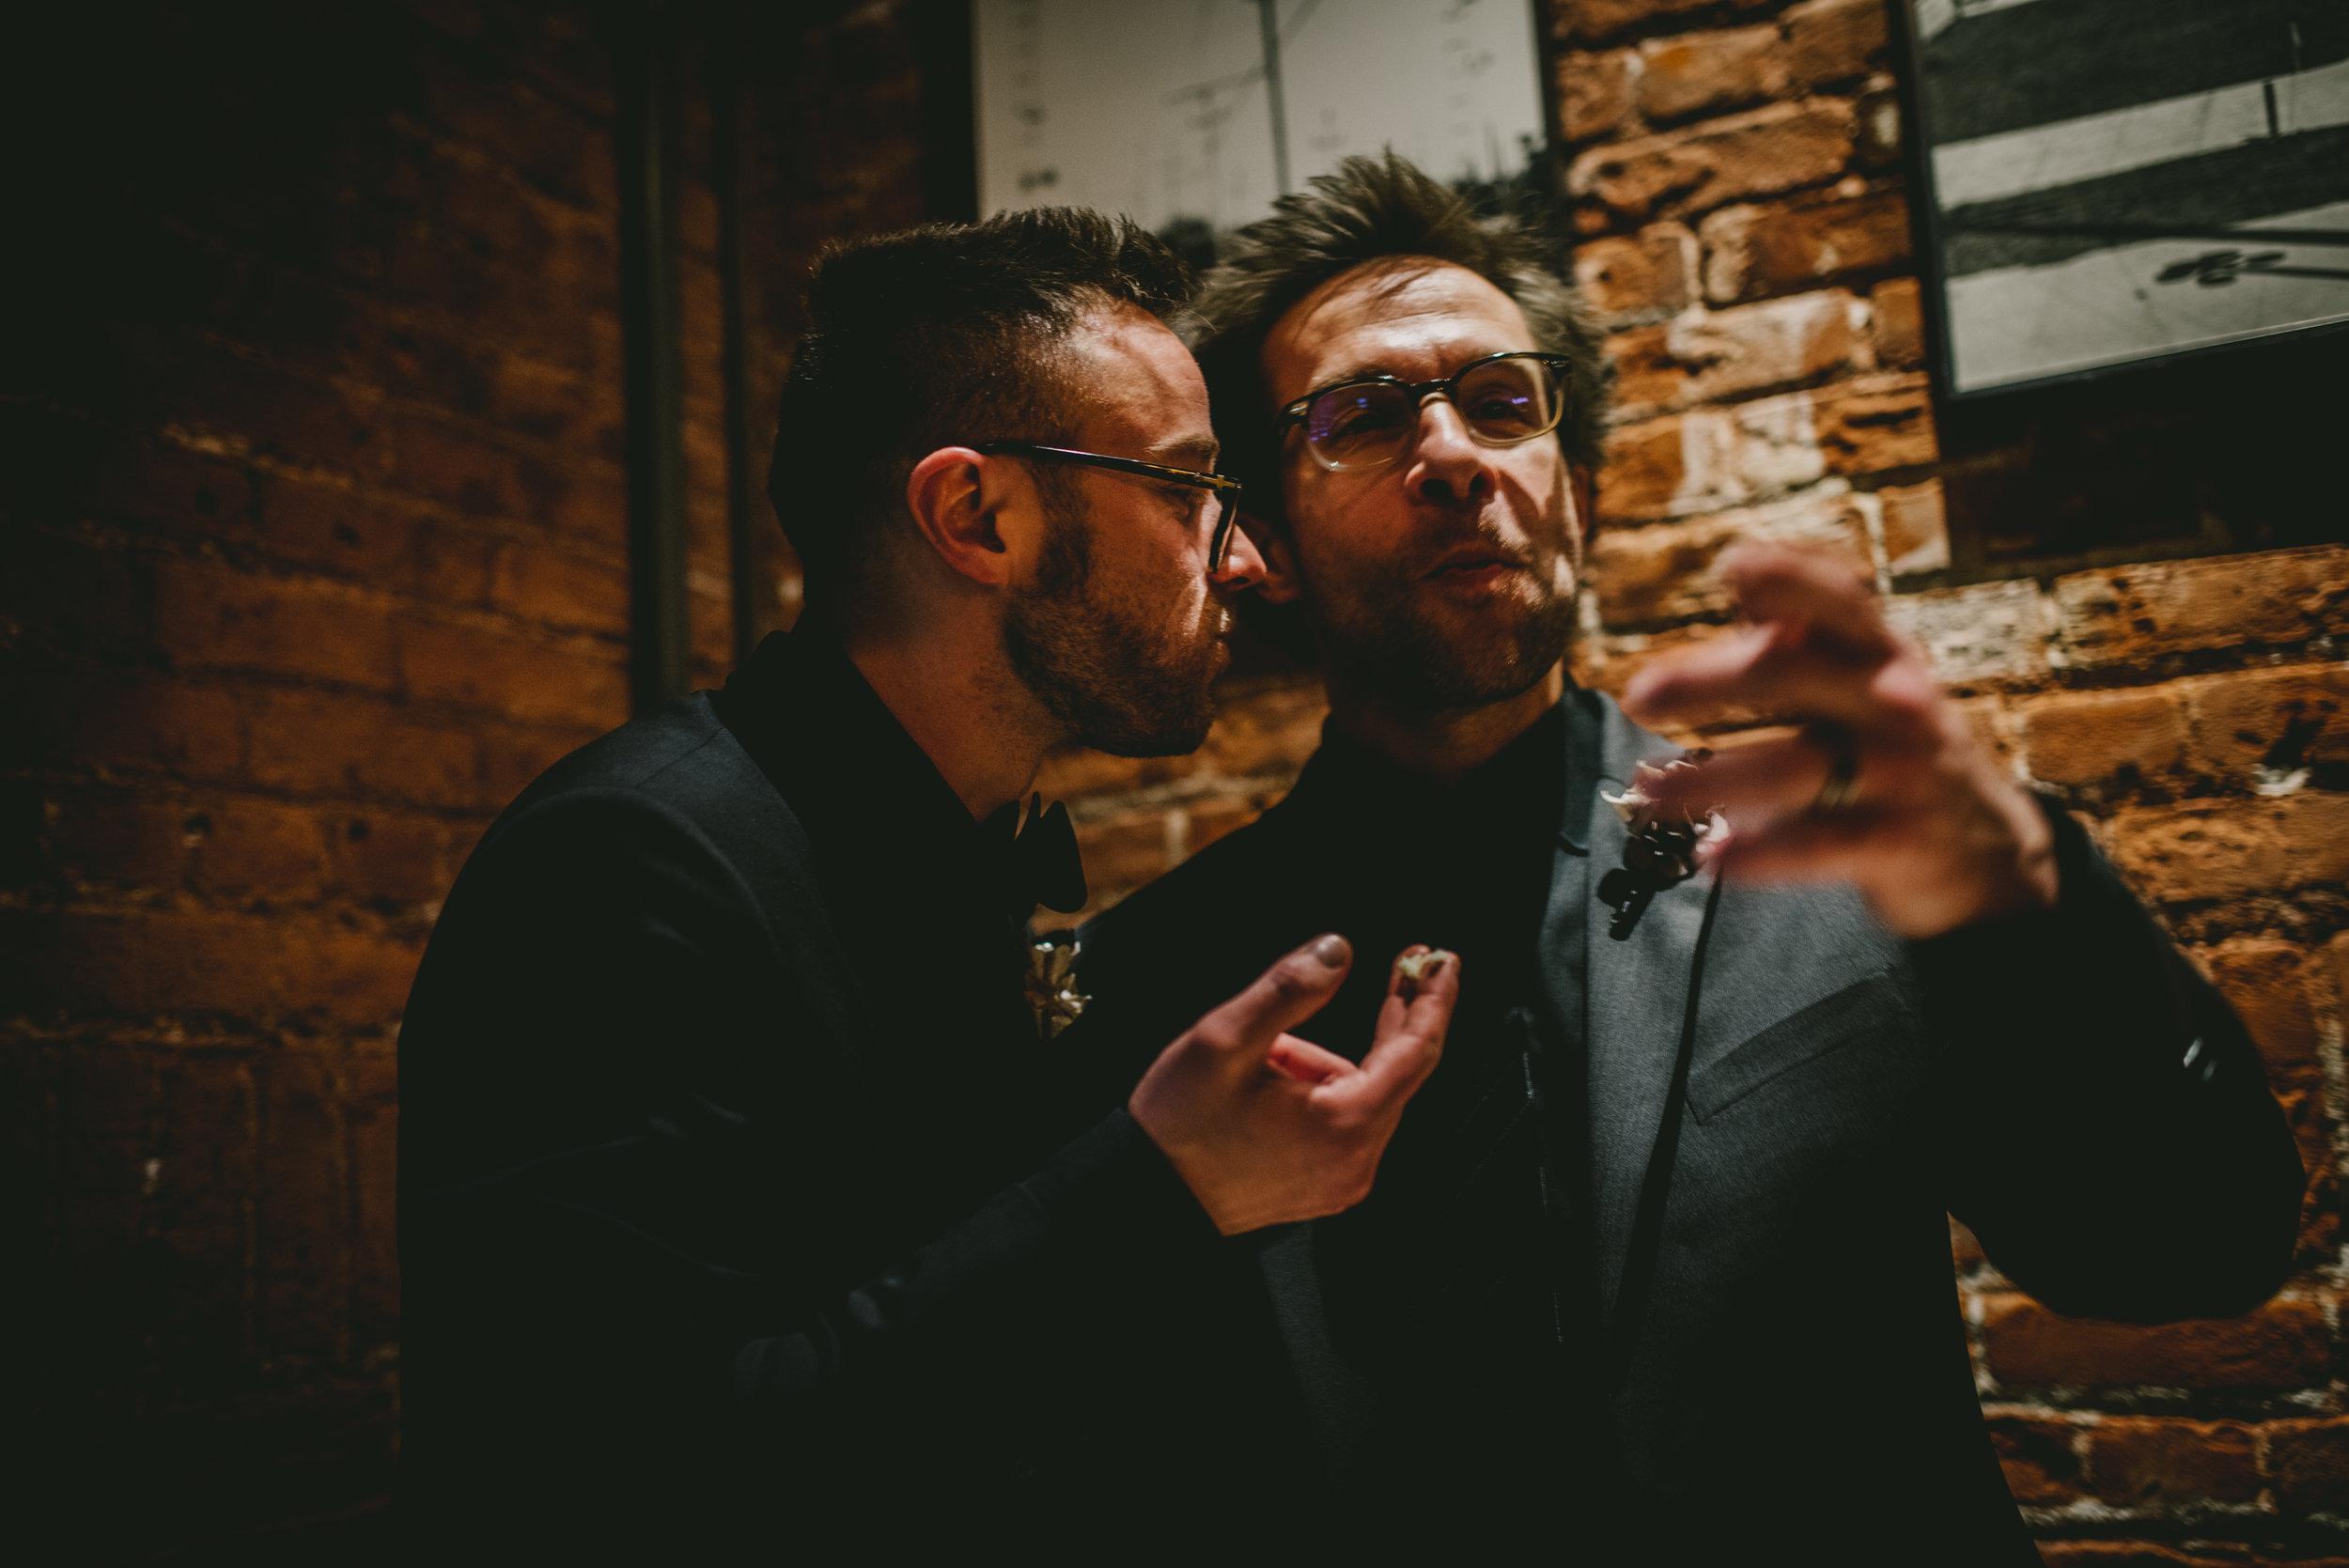 the-oregon-electric-company-same-sex-wedding-photograph.jpg